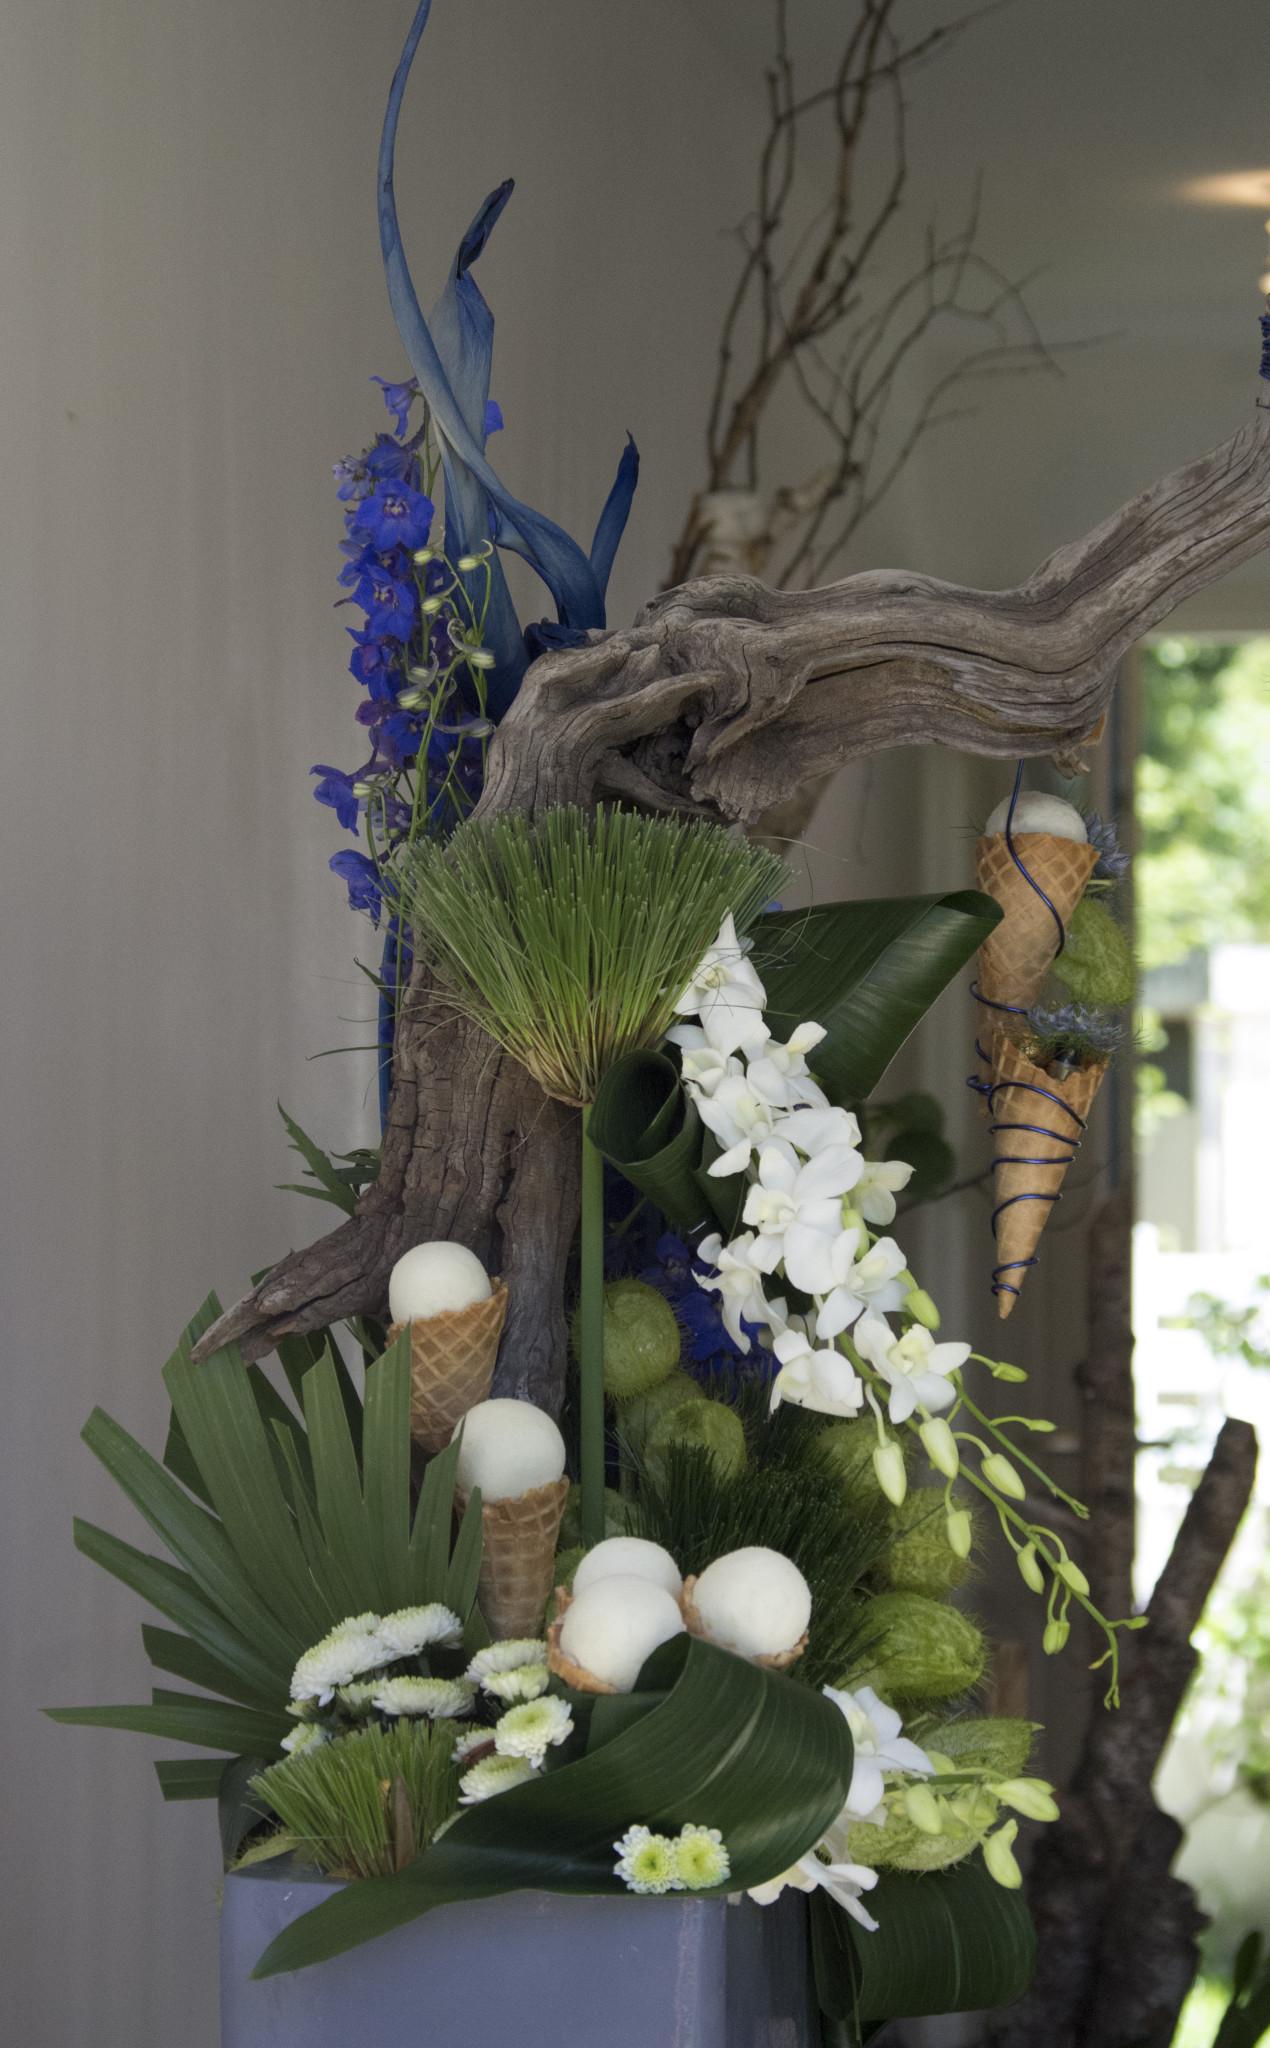 Design Floral : Sculpture et piquage